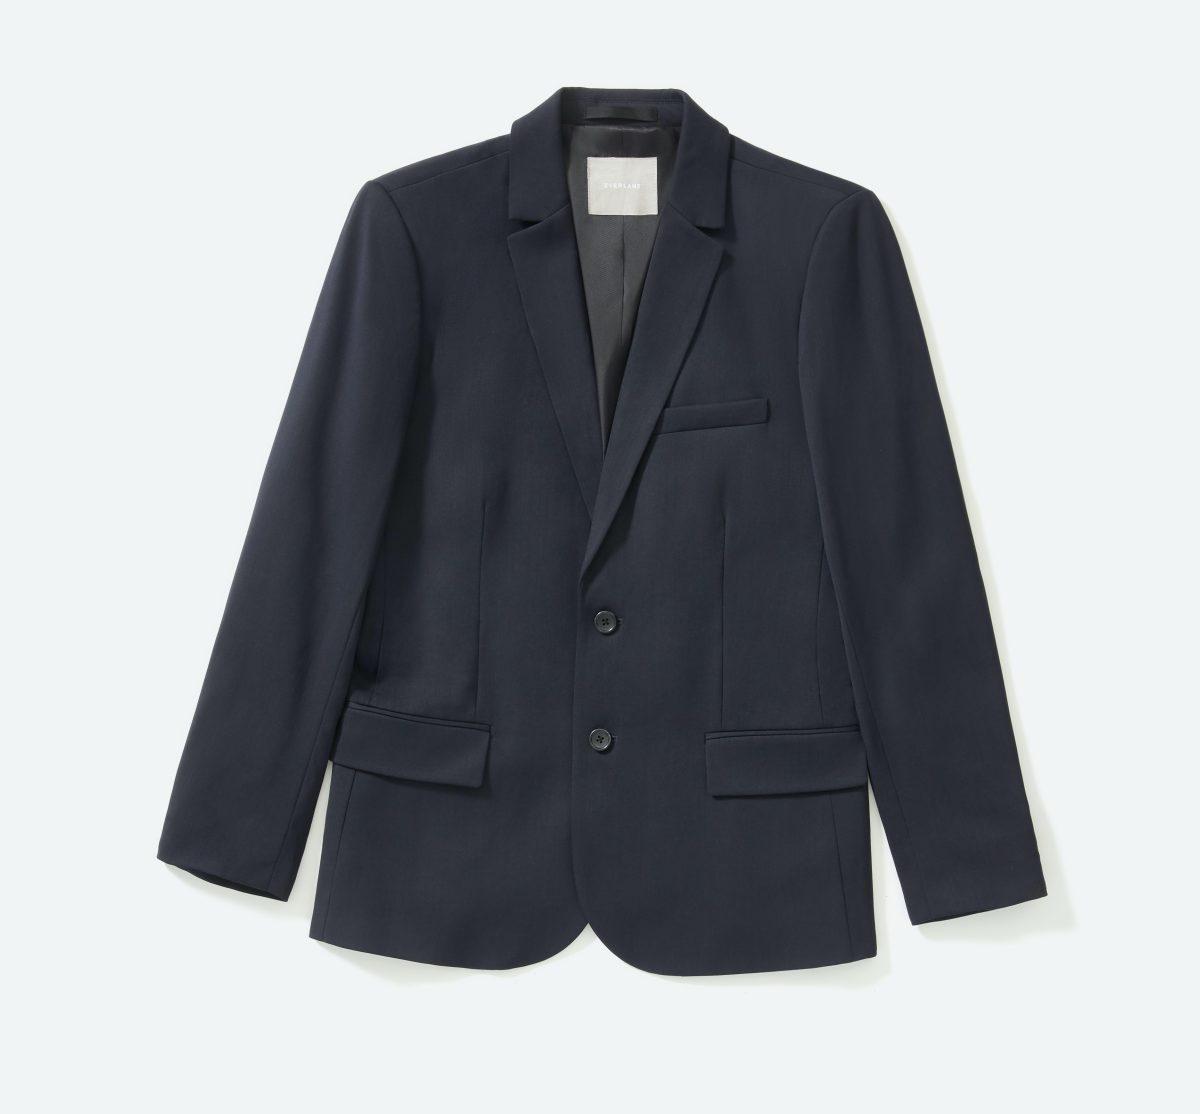 Everlane Italian Wool Suit